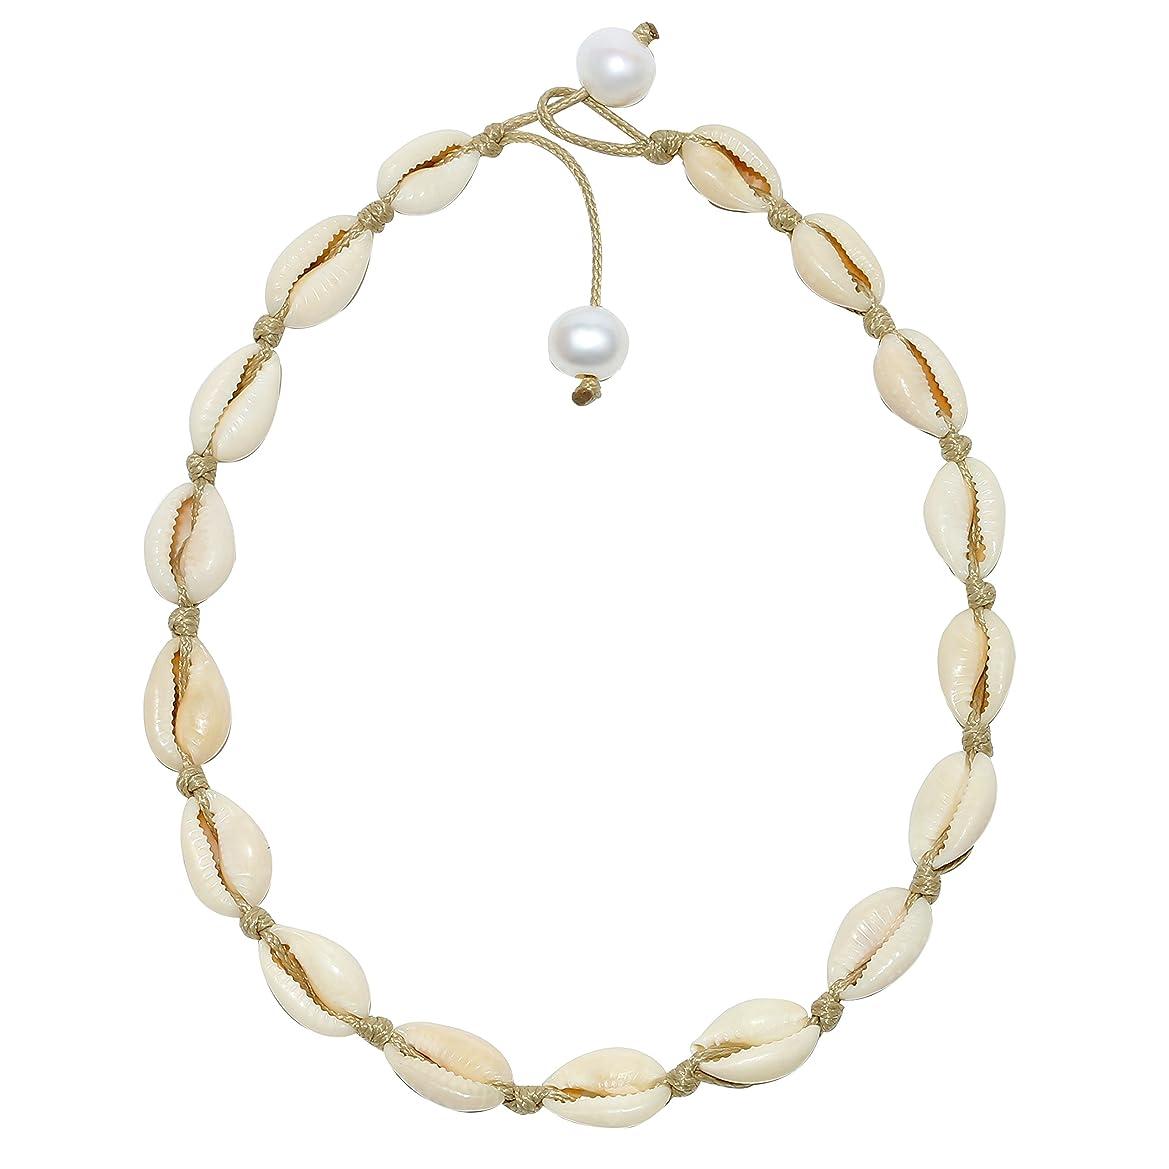 POTESSA Natural Shell Beads Handmade Hawaii Wakiki Beach Choker Adjustable for Girls Ladies mrdpmmomao5